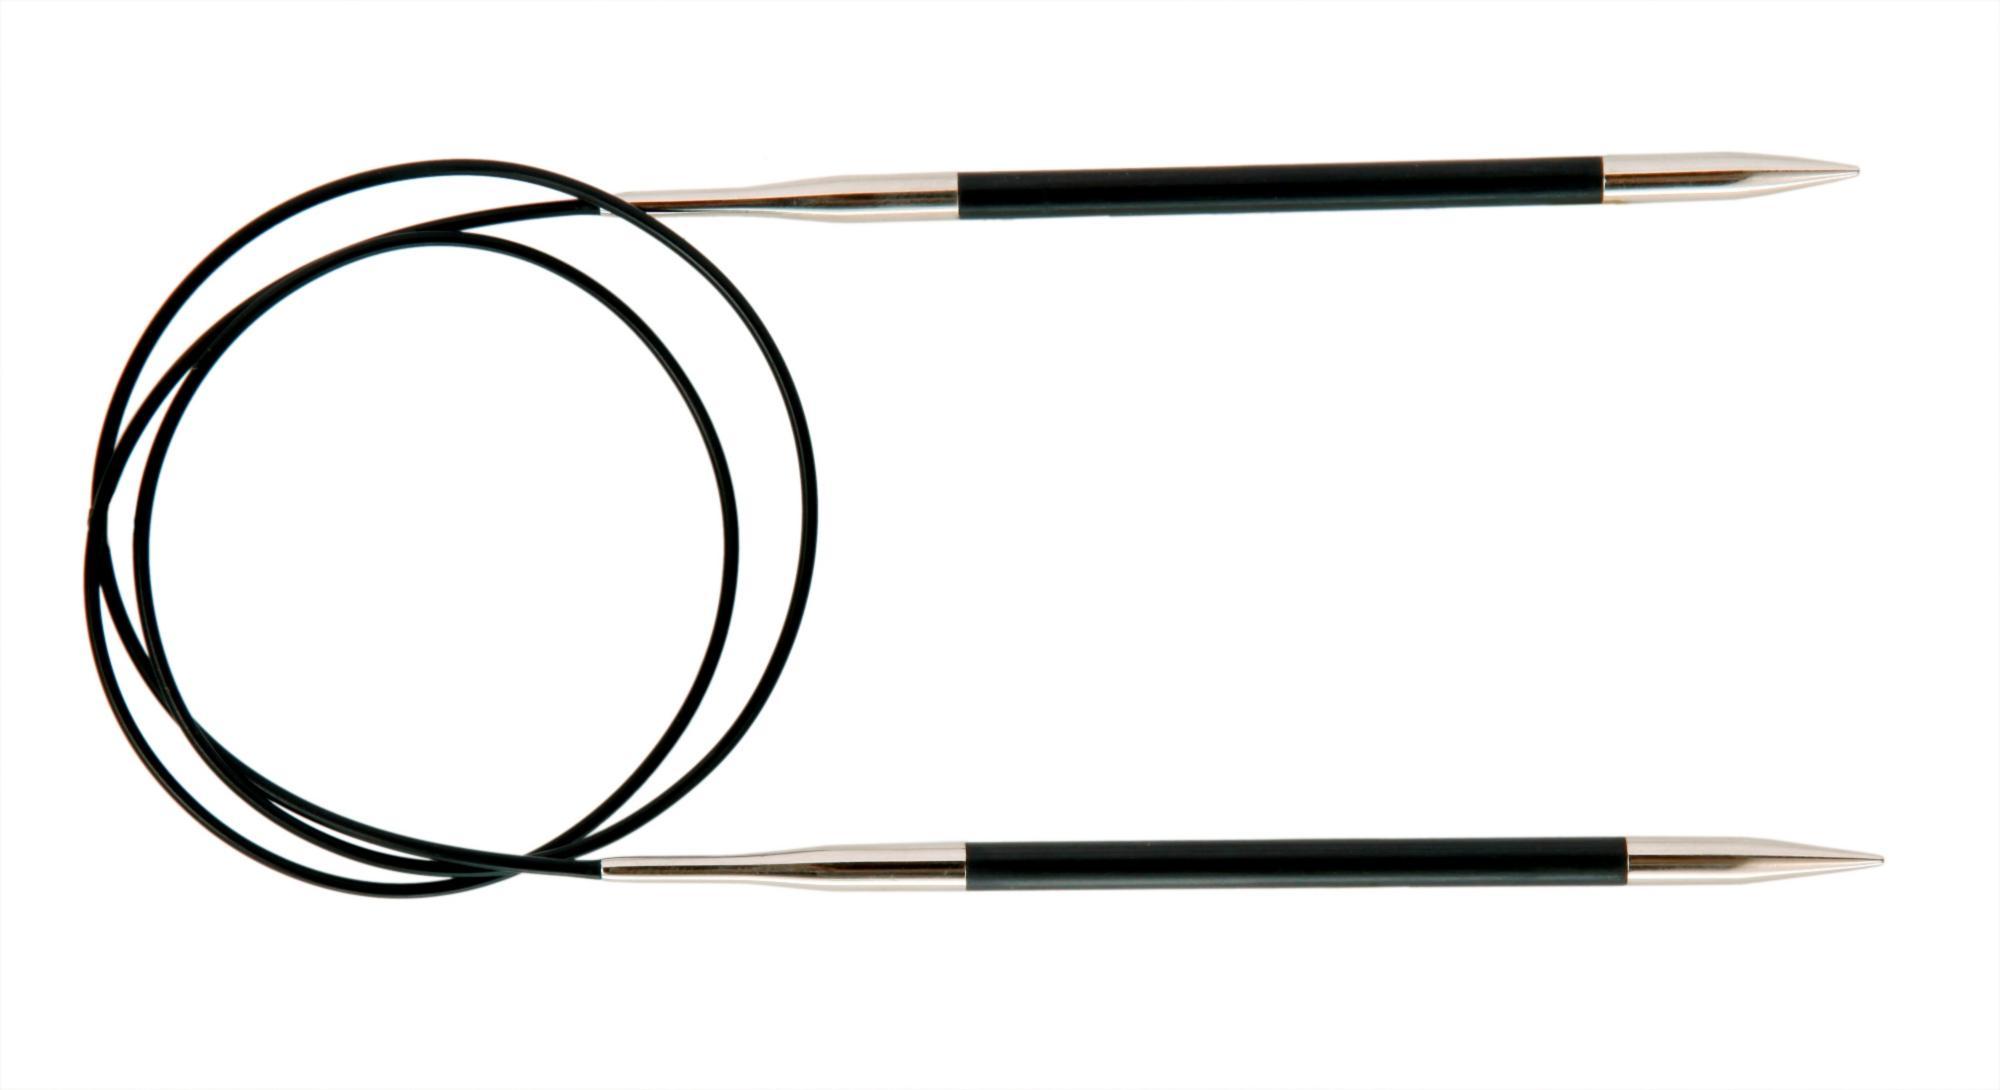 Спицы круговые 80 см Karbonz KnitPro, 41194, 7.00 мм